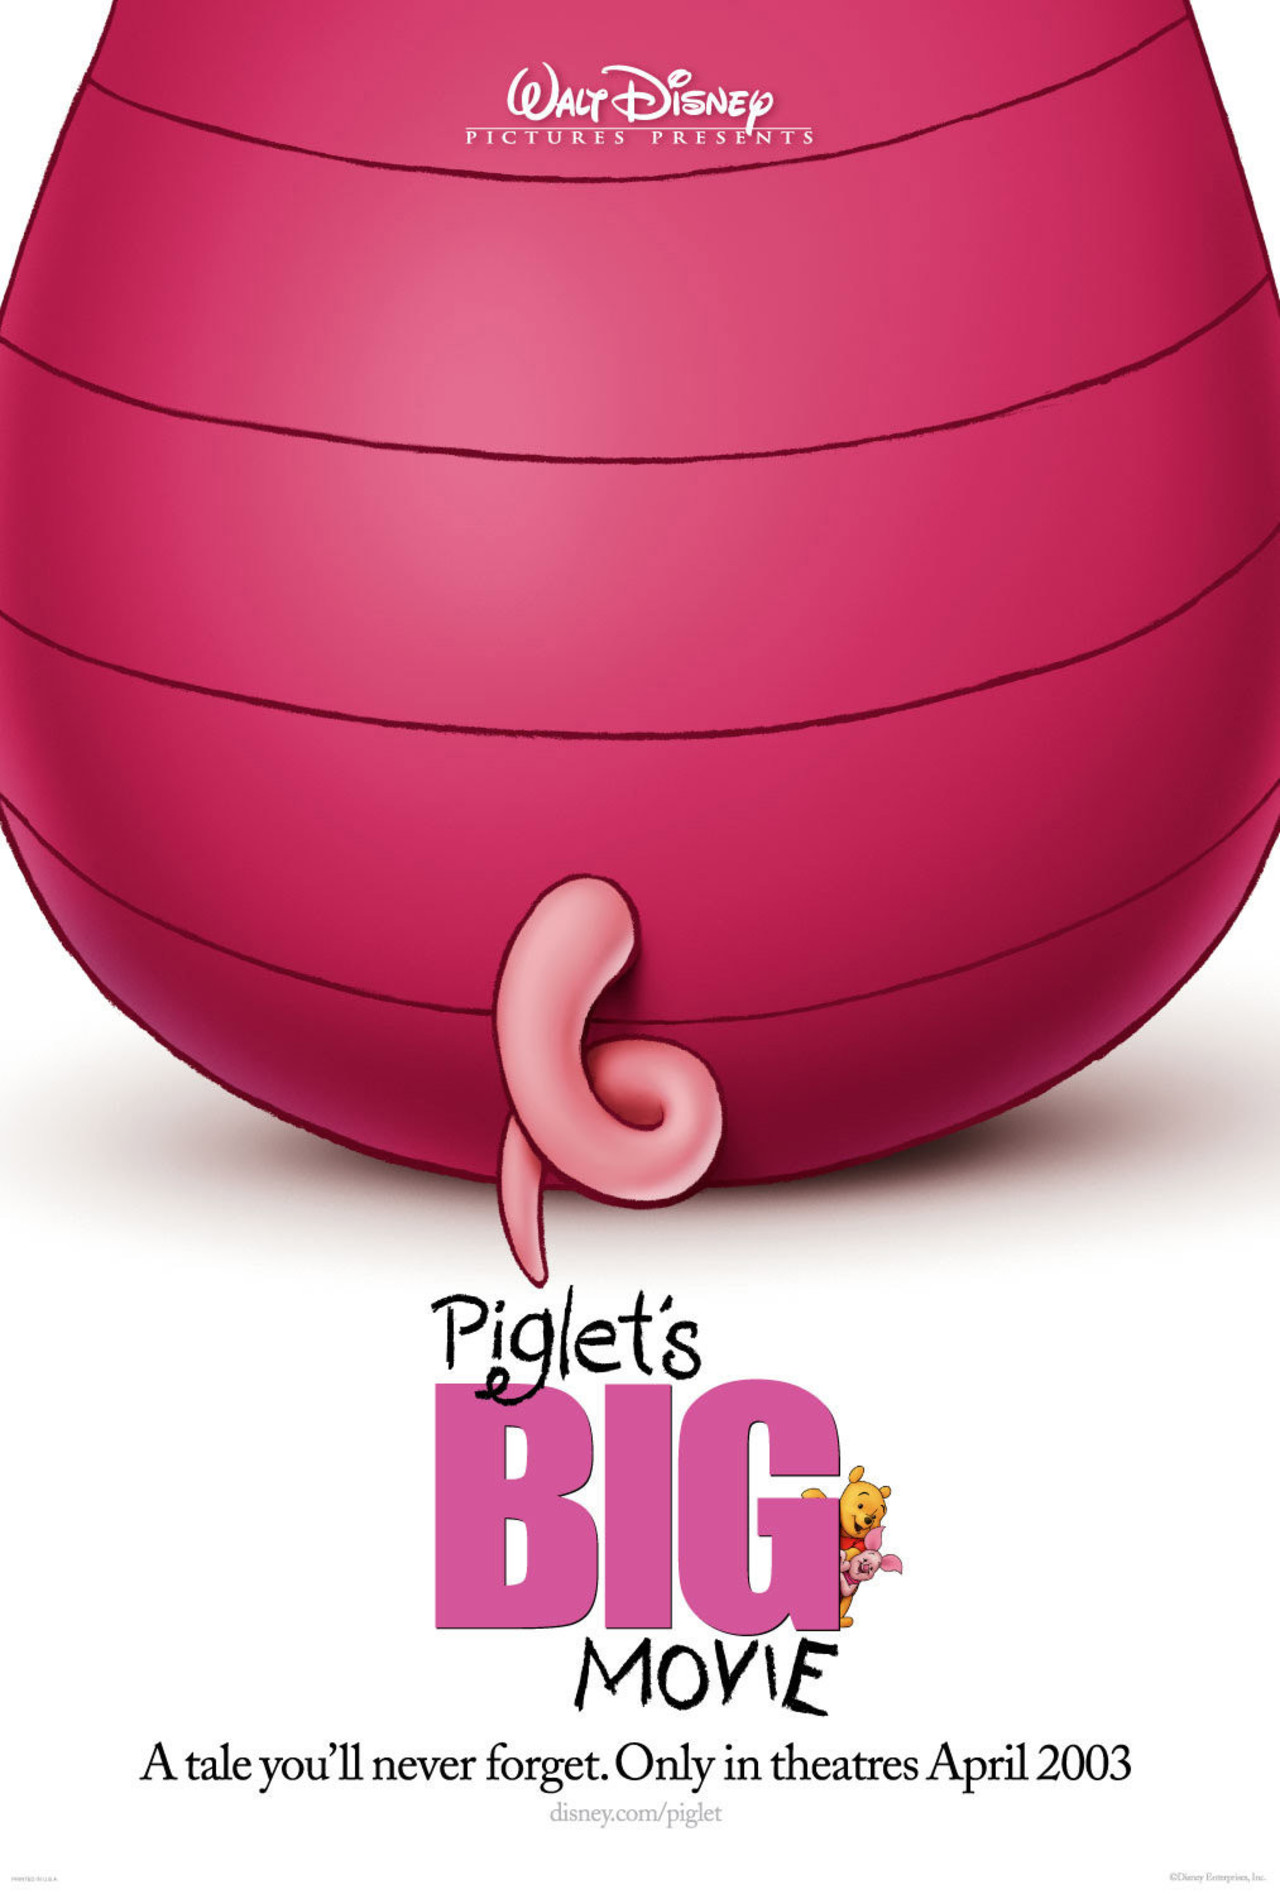 Game boy color pooh wiki - Piglet S Big Movie